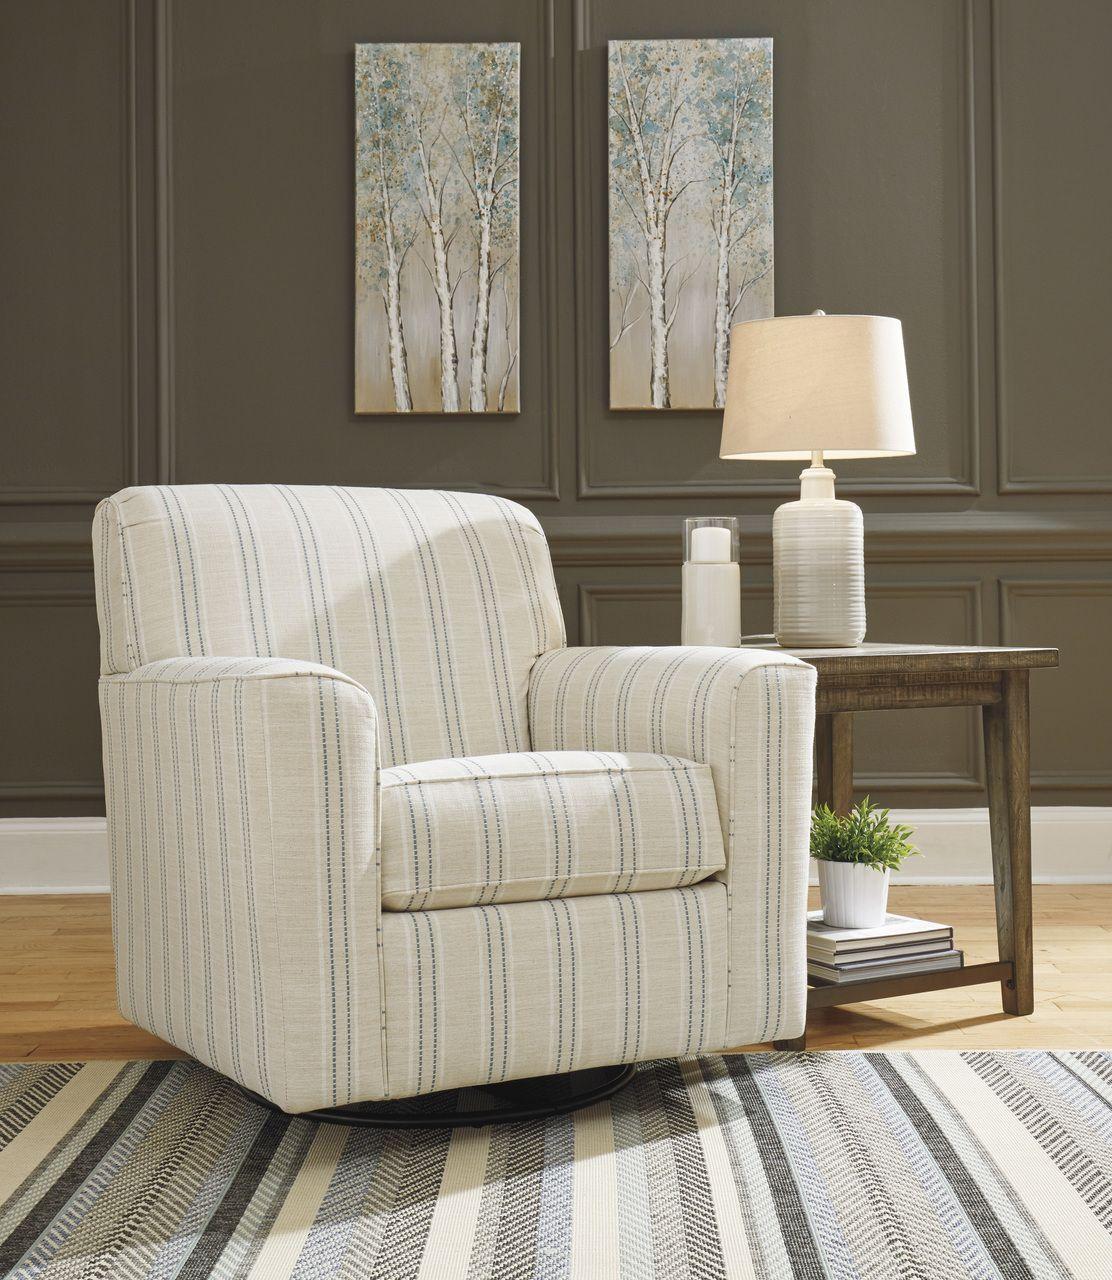 Alandari Gray Swivel Glider Accent Chair Accent chairs